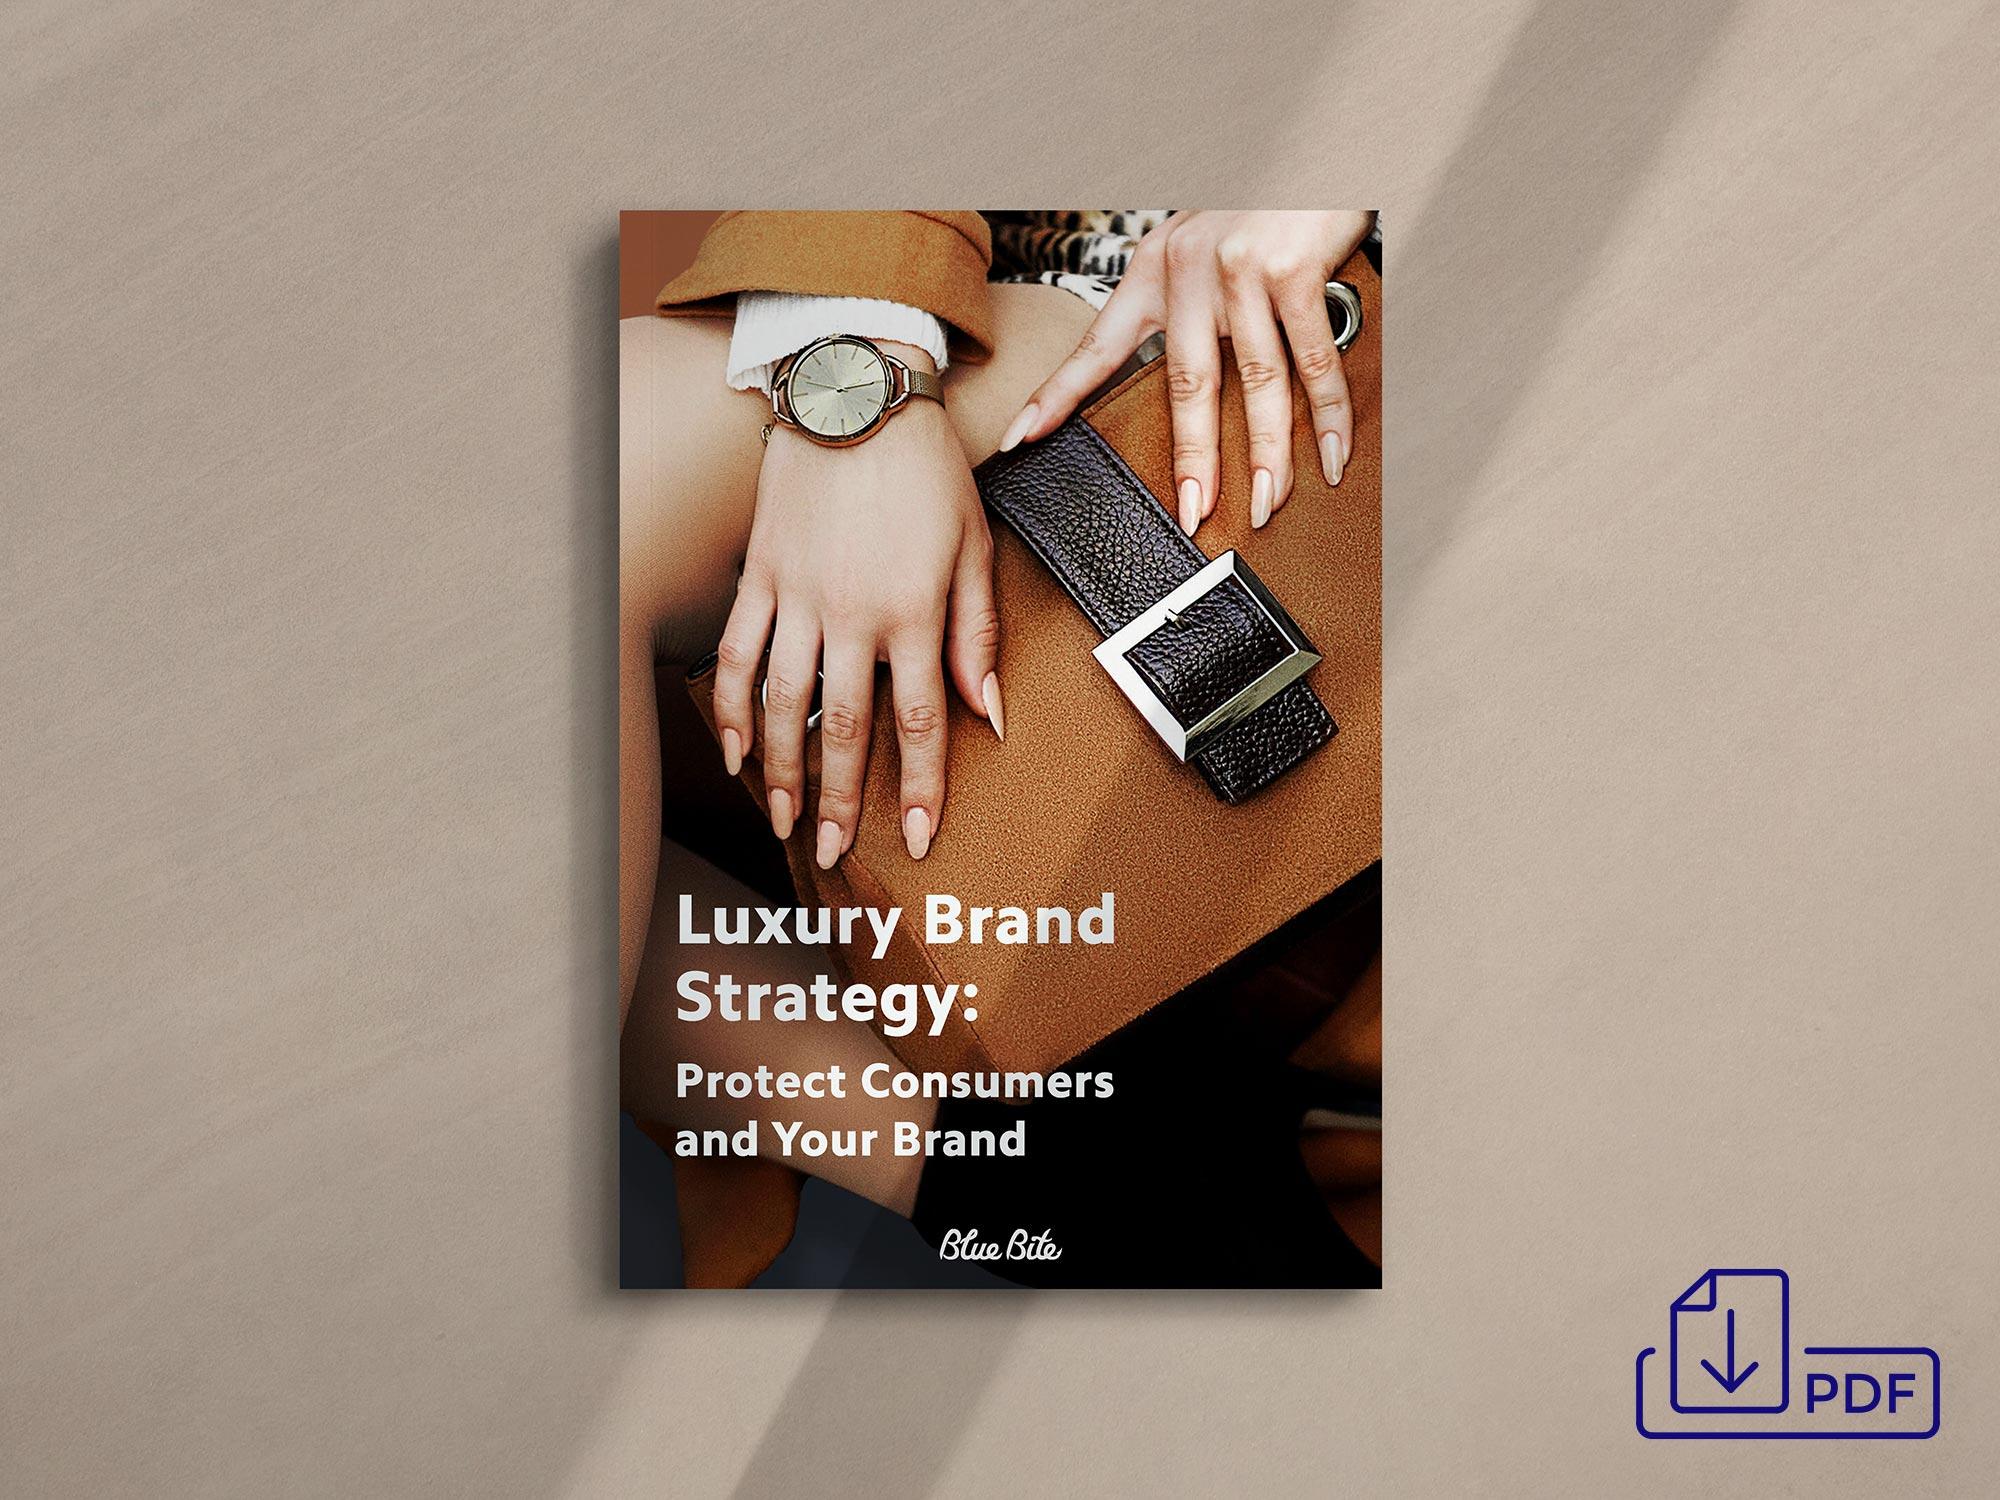 Get the Luxury Brand Strategy PDF